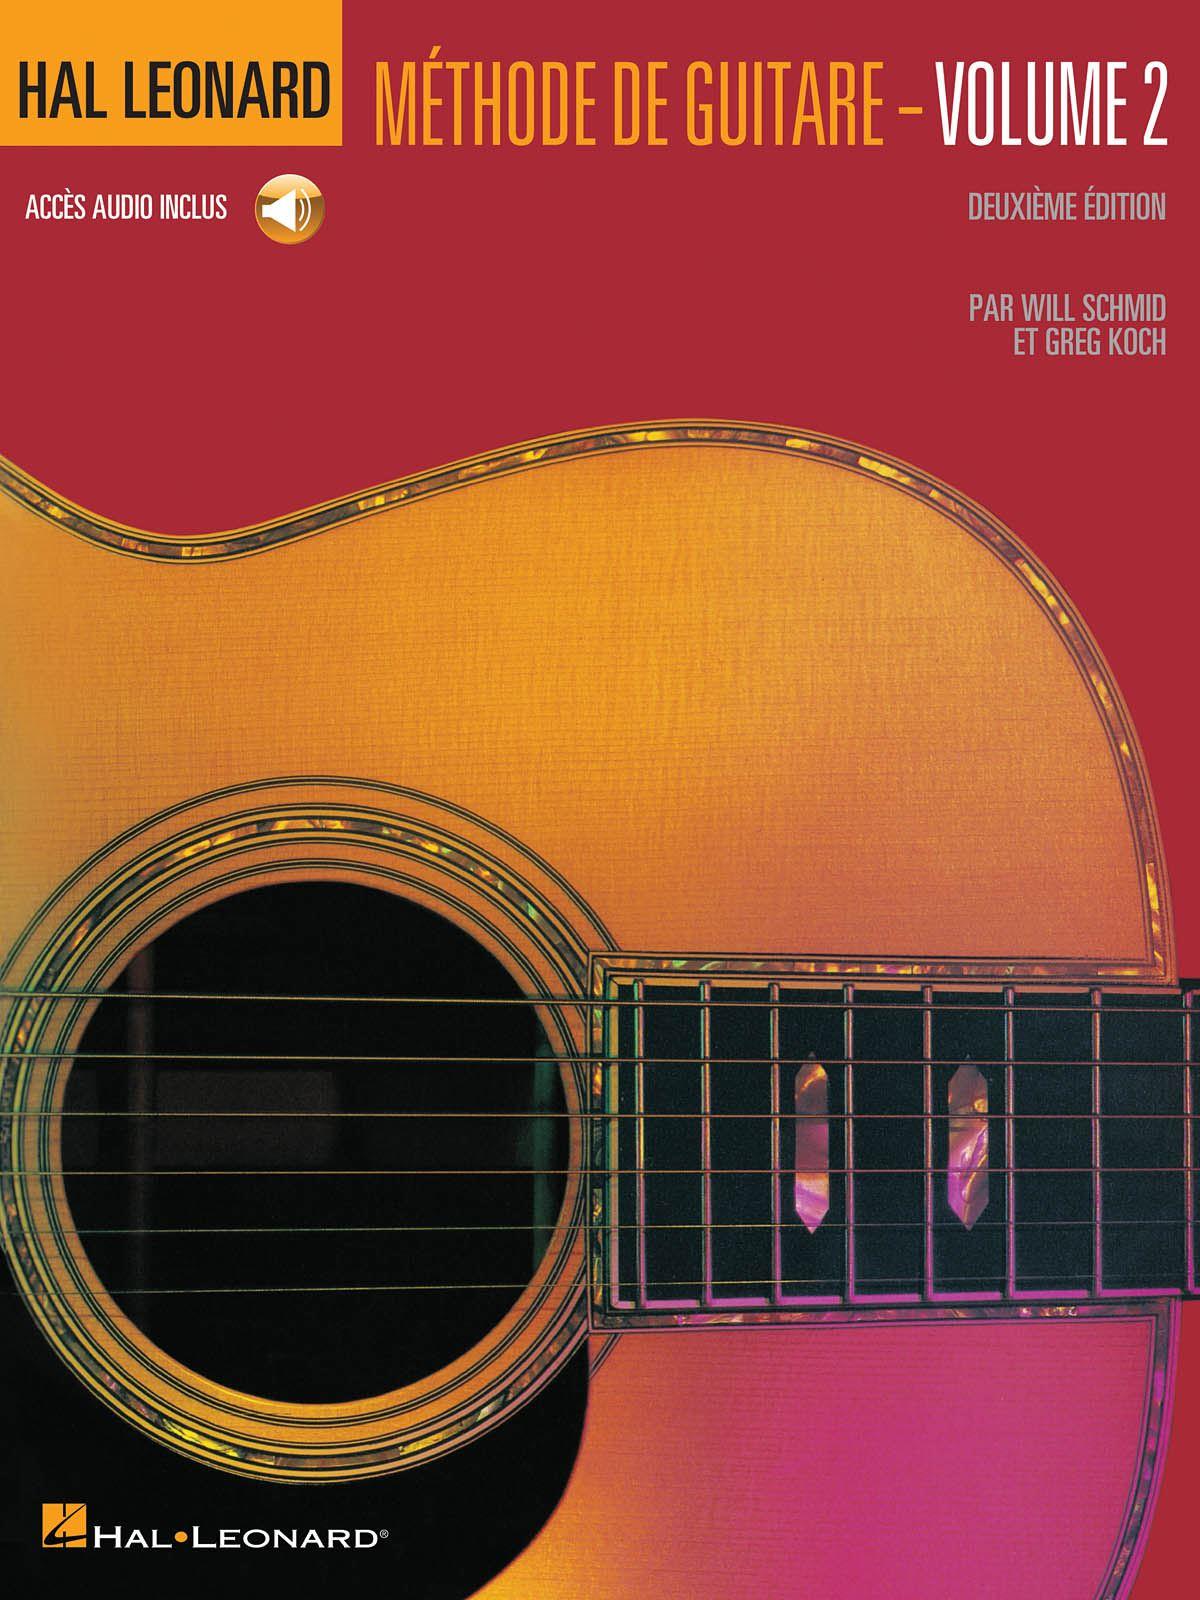 HAL LEONARD METHODE DE GUITARE VOLUME 2 (DEUXIEME EDITION AVEC CD) GTR